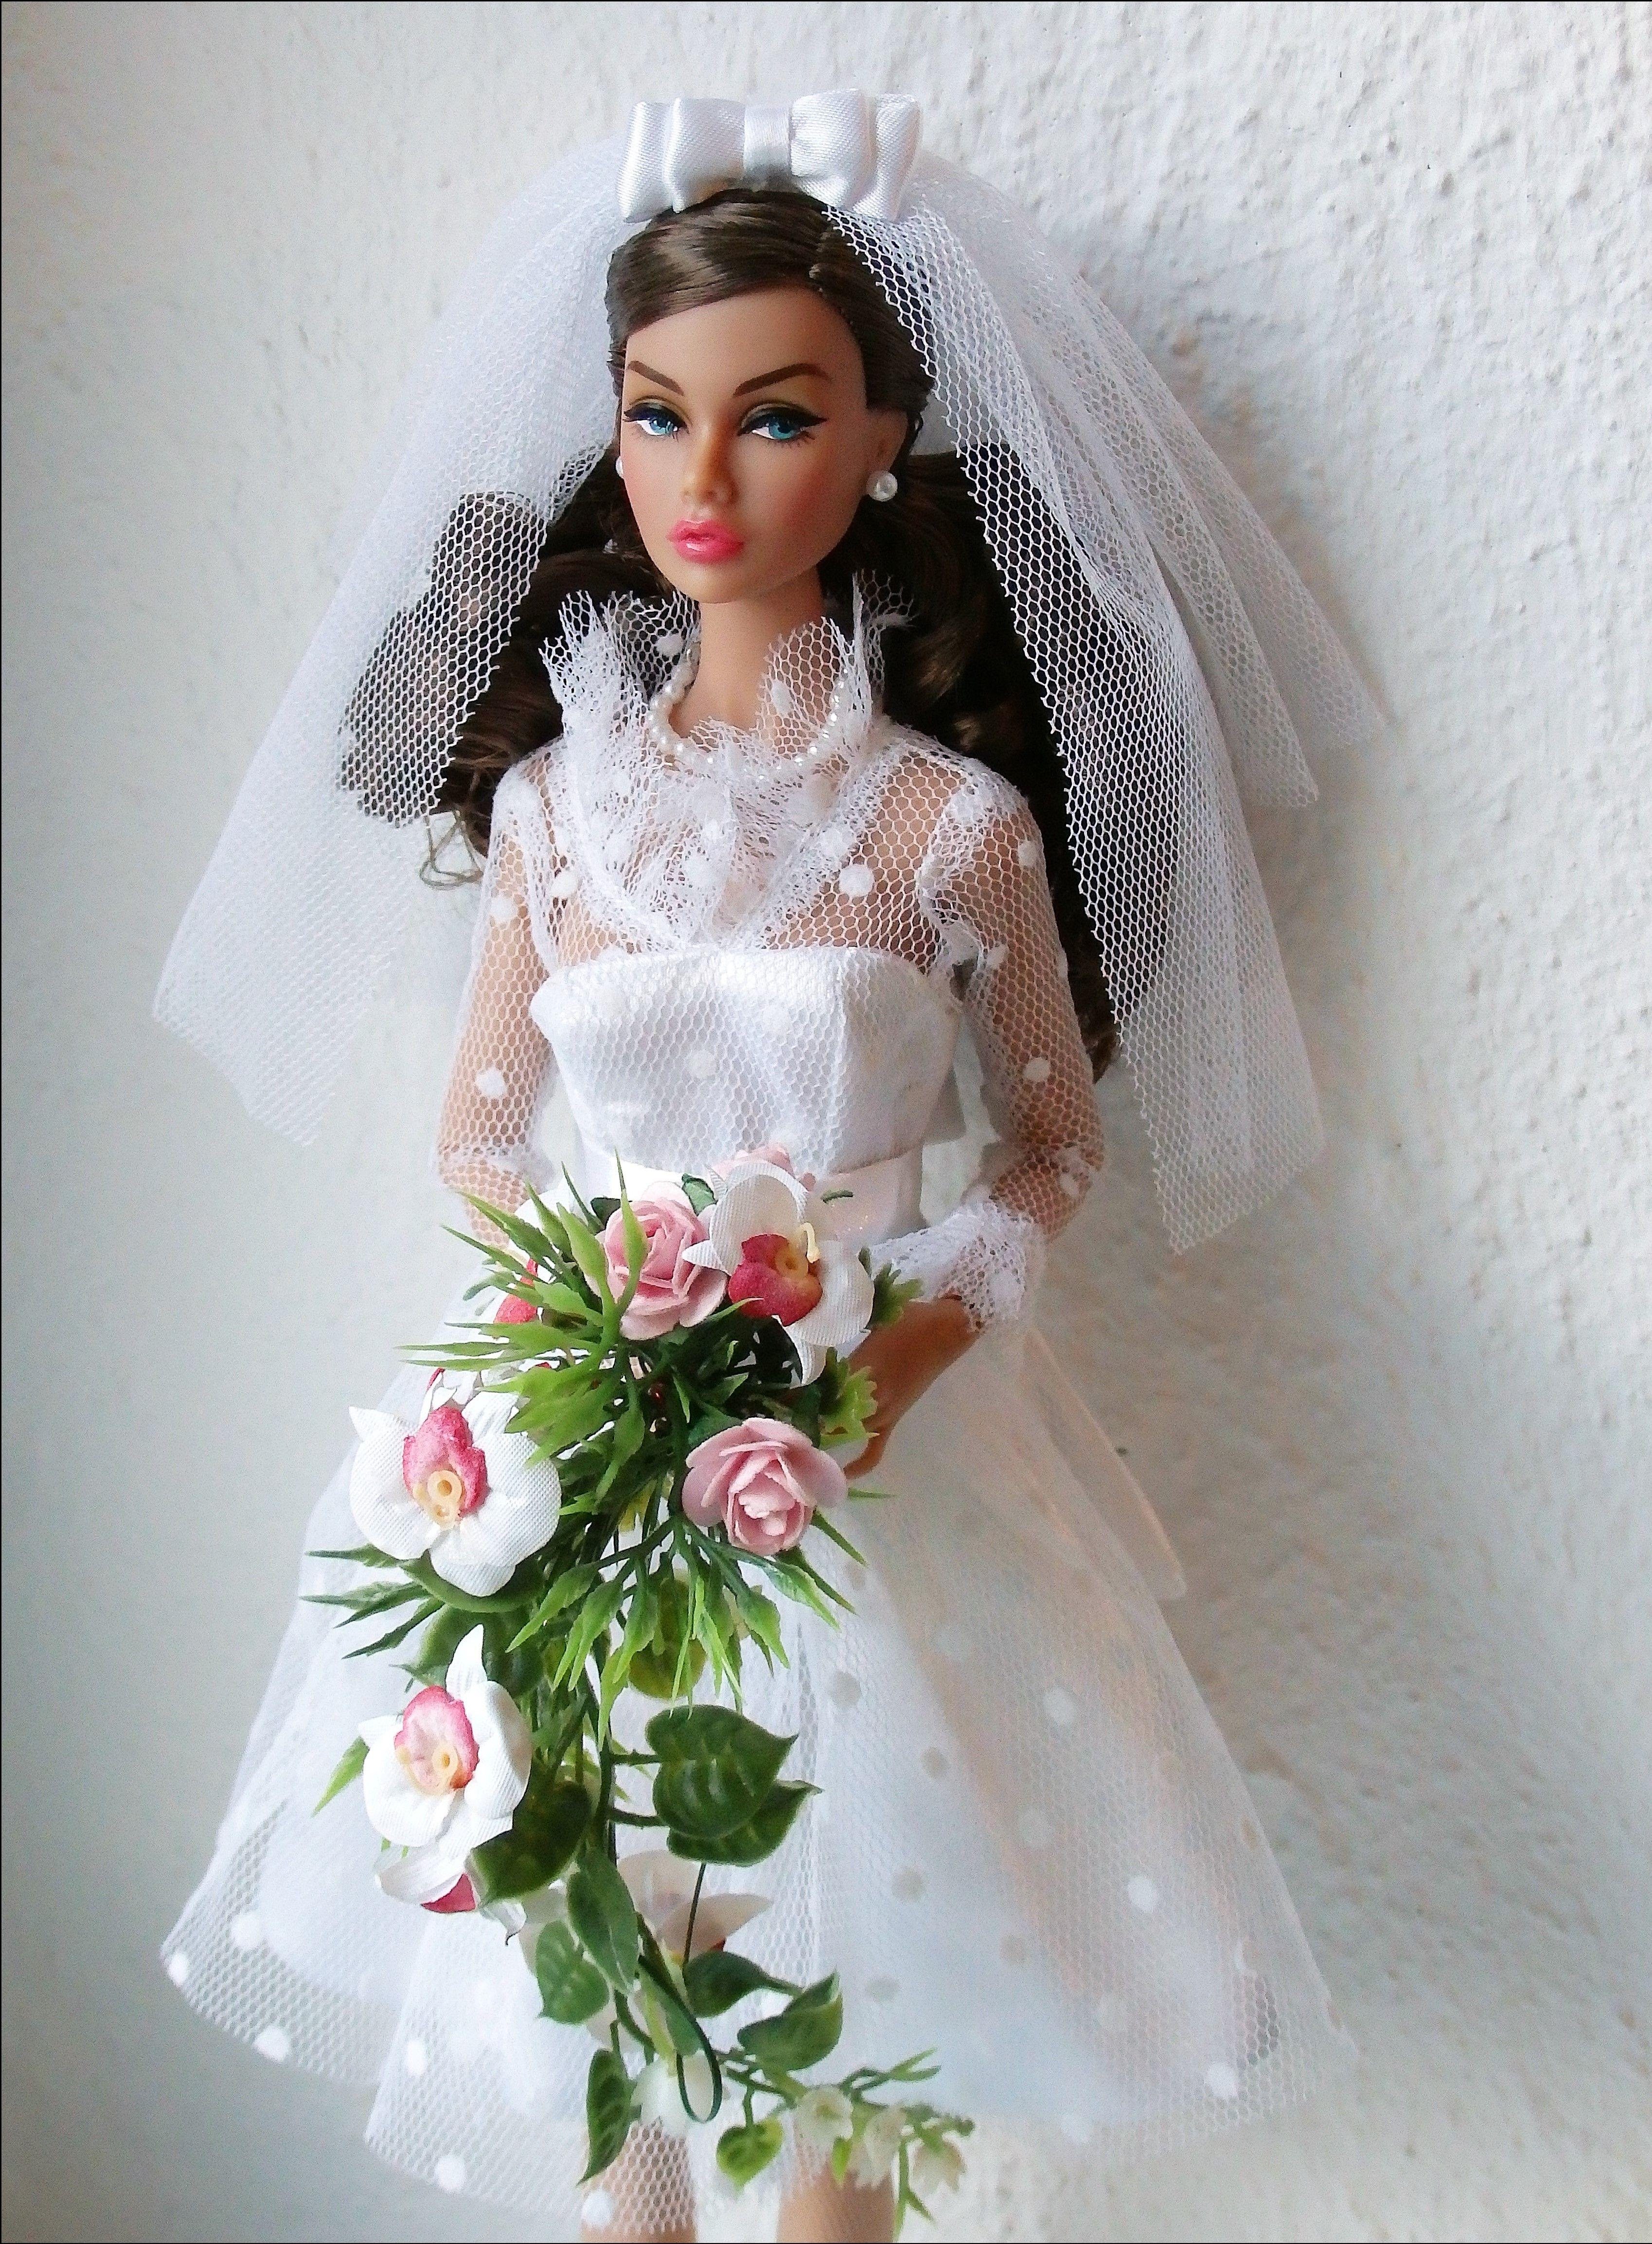 Doll wedding dress   Jasmin Lau  bride dolls  Pinterest  Dolls Barbie